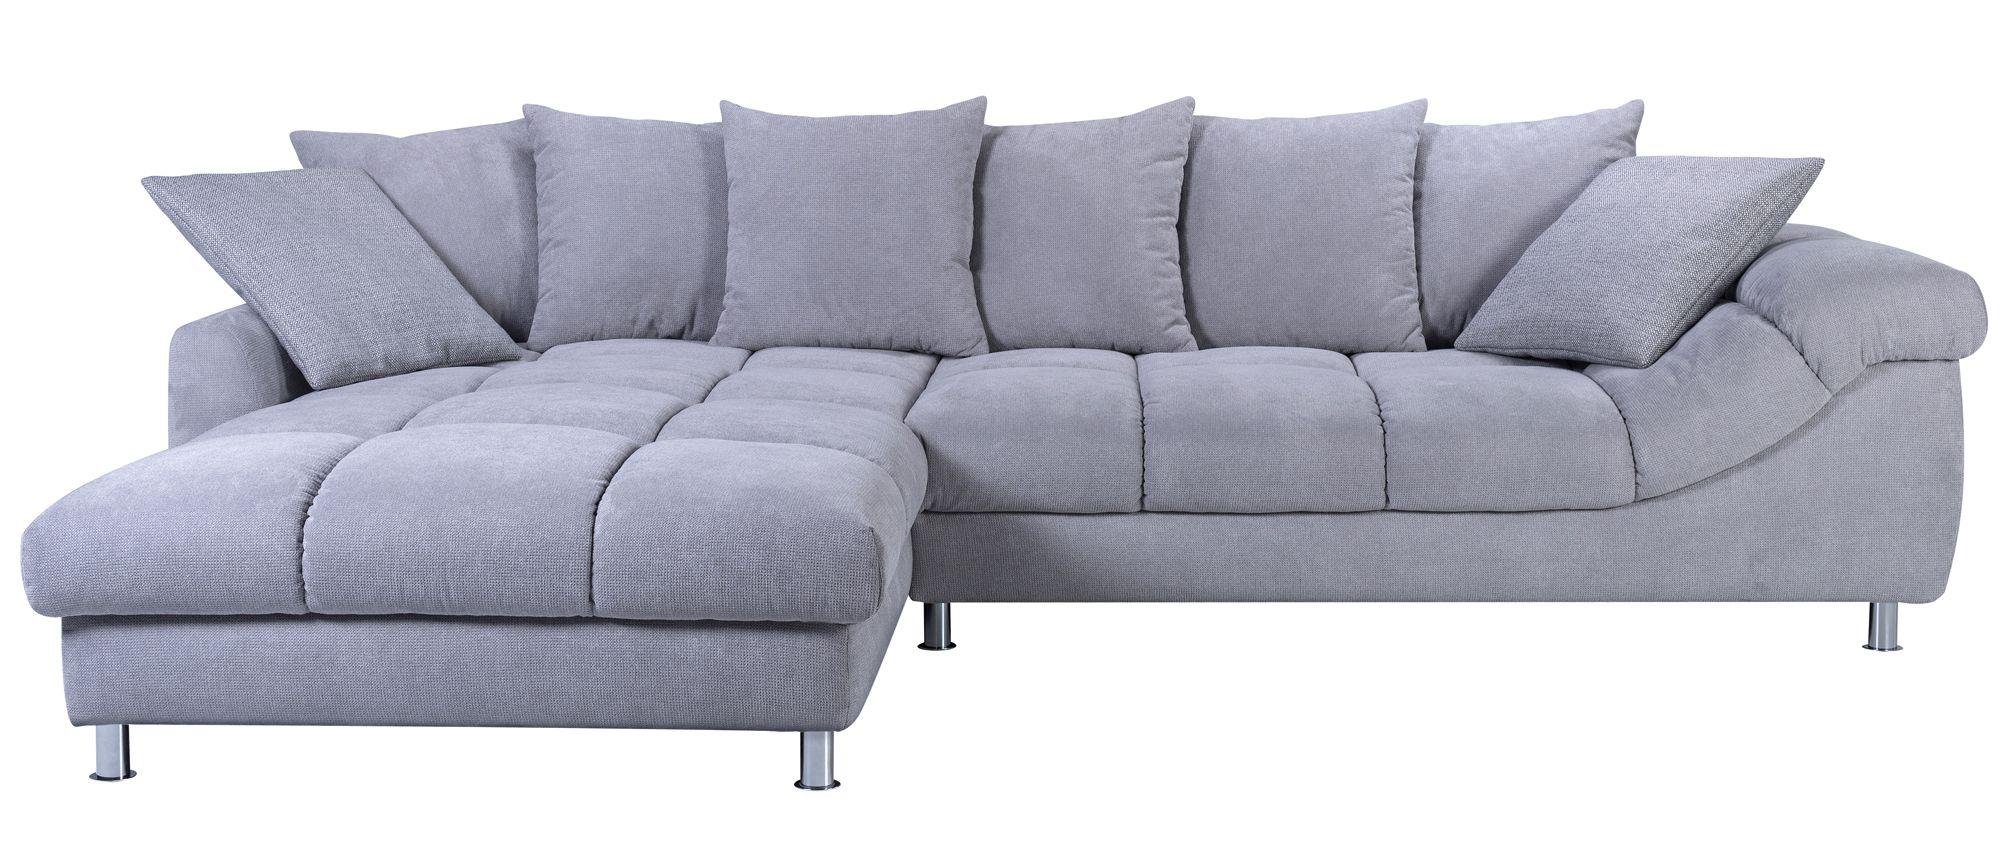 sofa rundecke 7588 made house decor. Black Bedroom Furniture Sets. Home Design Ideas